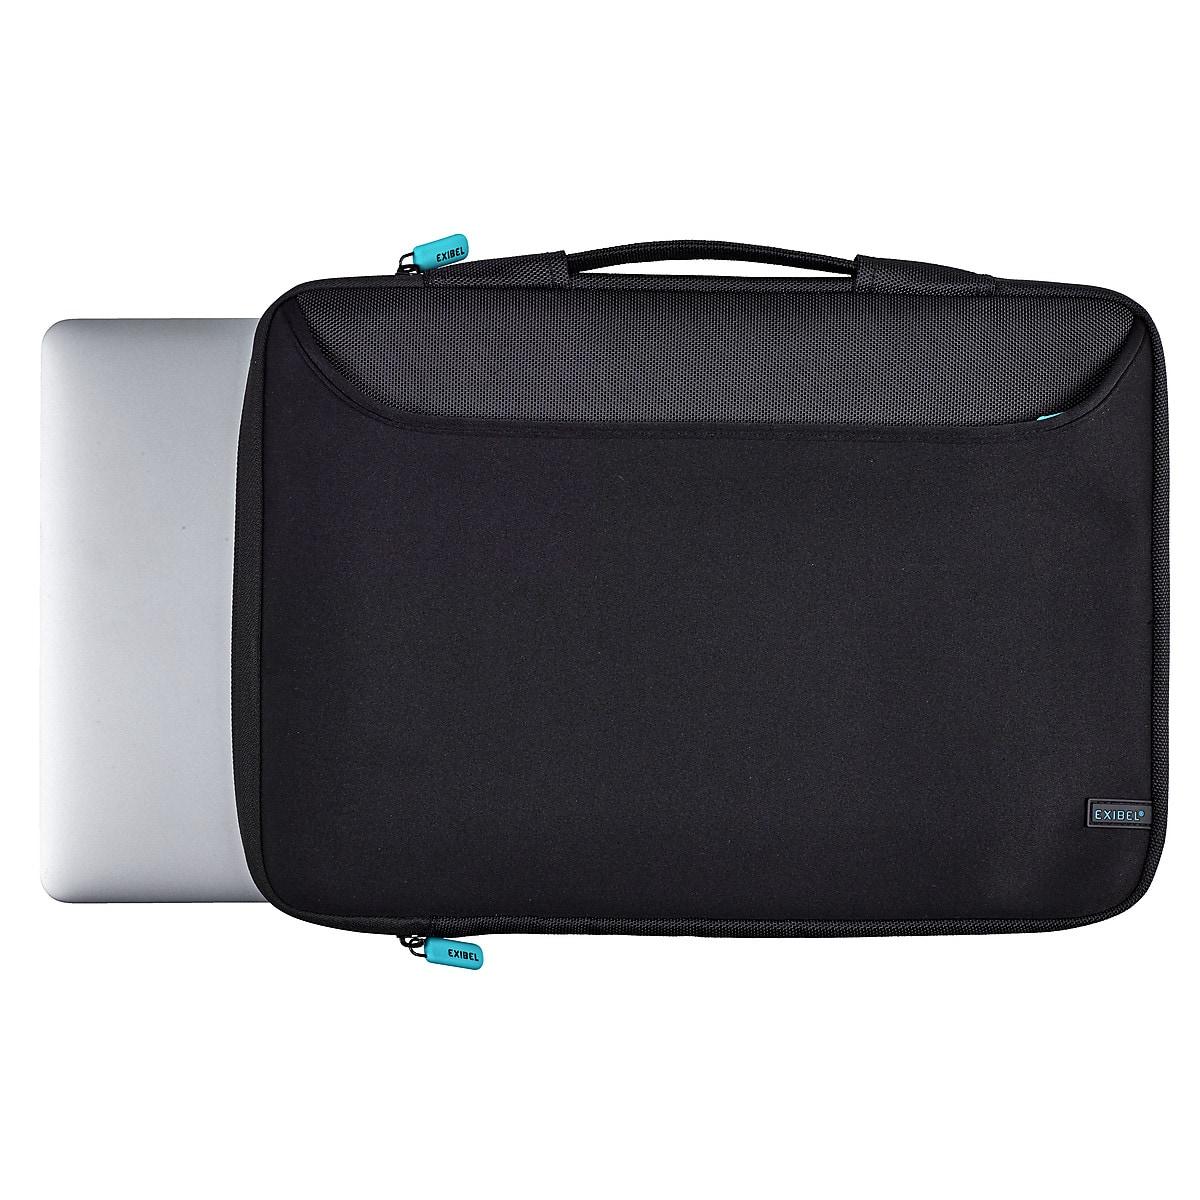 Exibel laptopveske, 15,6